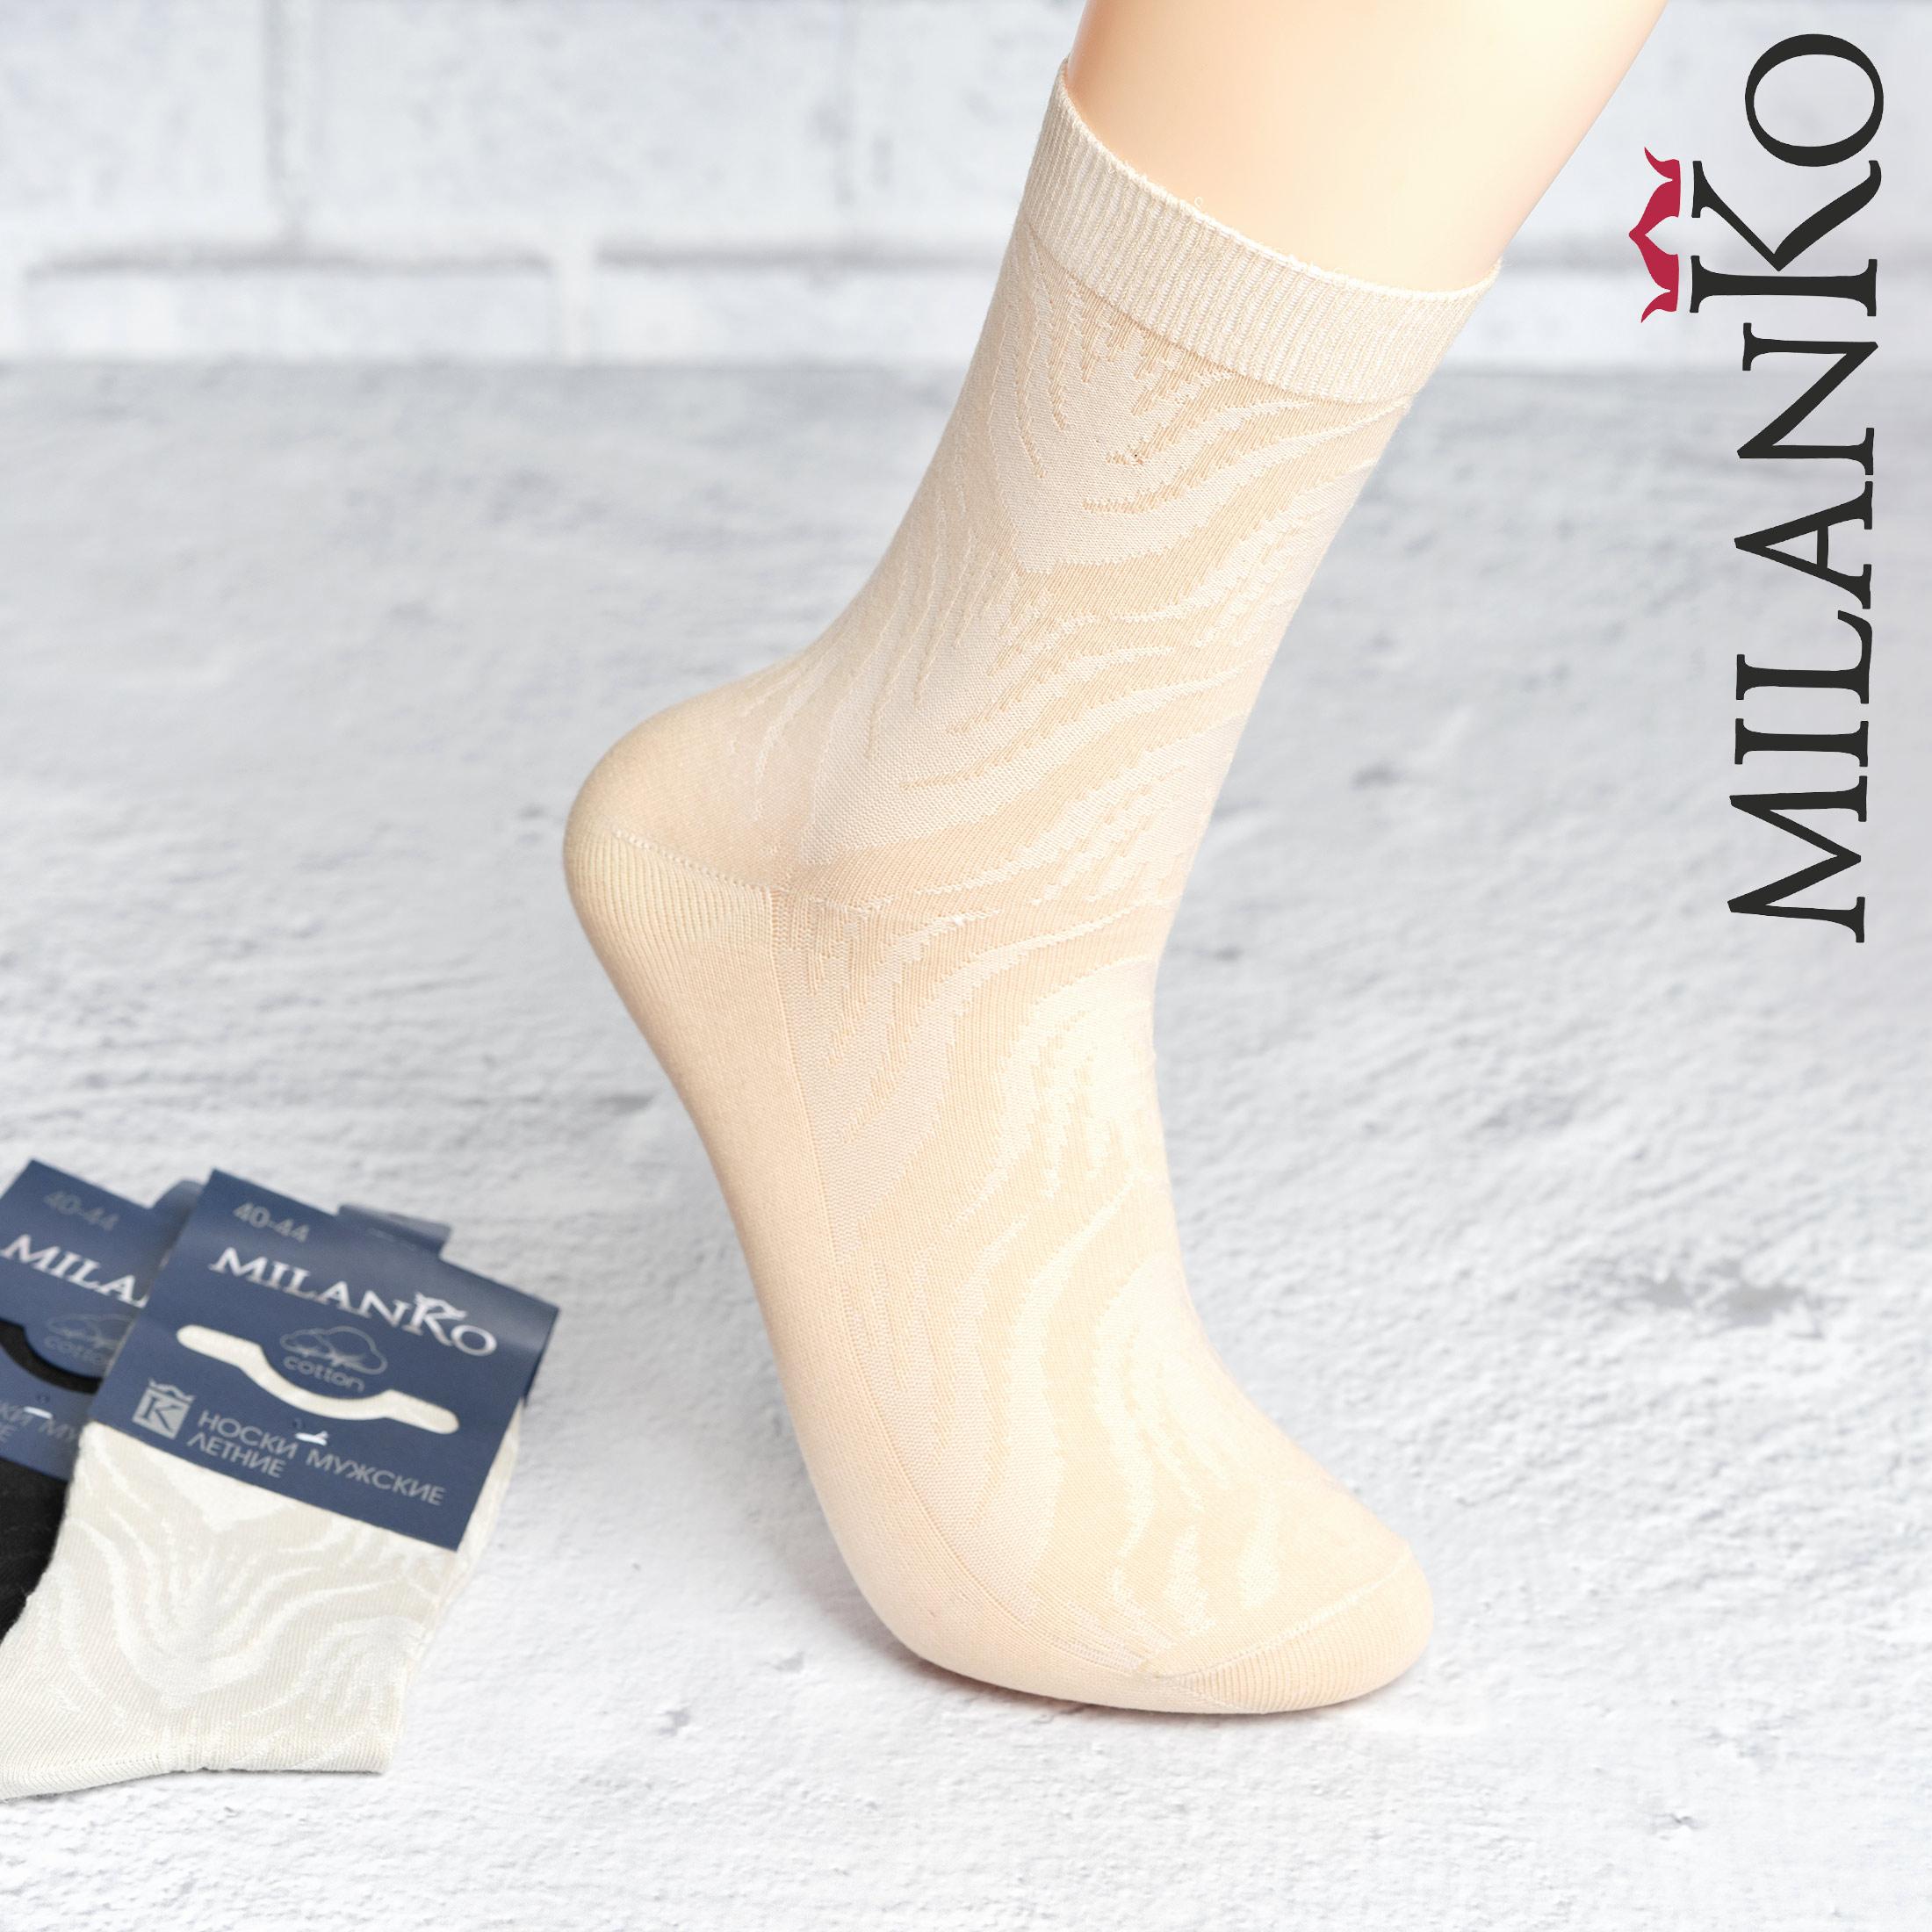 РАСПРОДАЖА  40-44 БЕЖЕВЫЙ MILANKO   ,Мужские носки летние с выбитым рисунком (Узор 3) MilanKo N-180